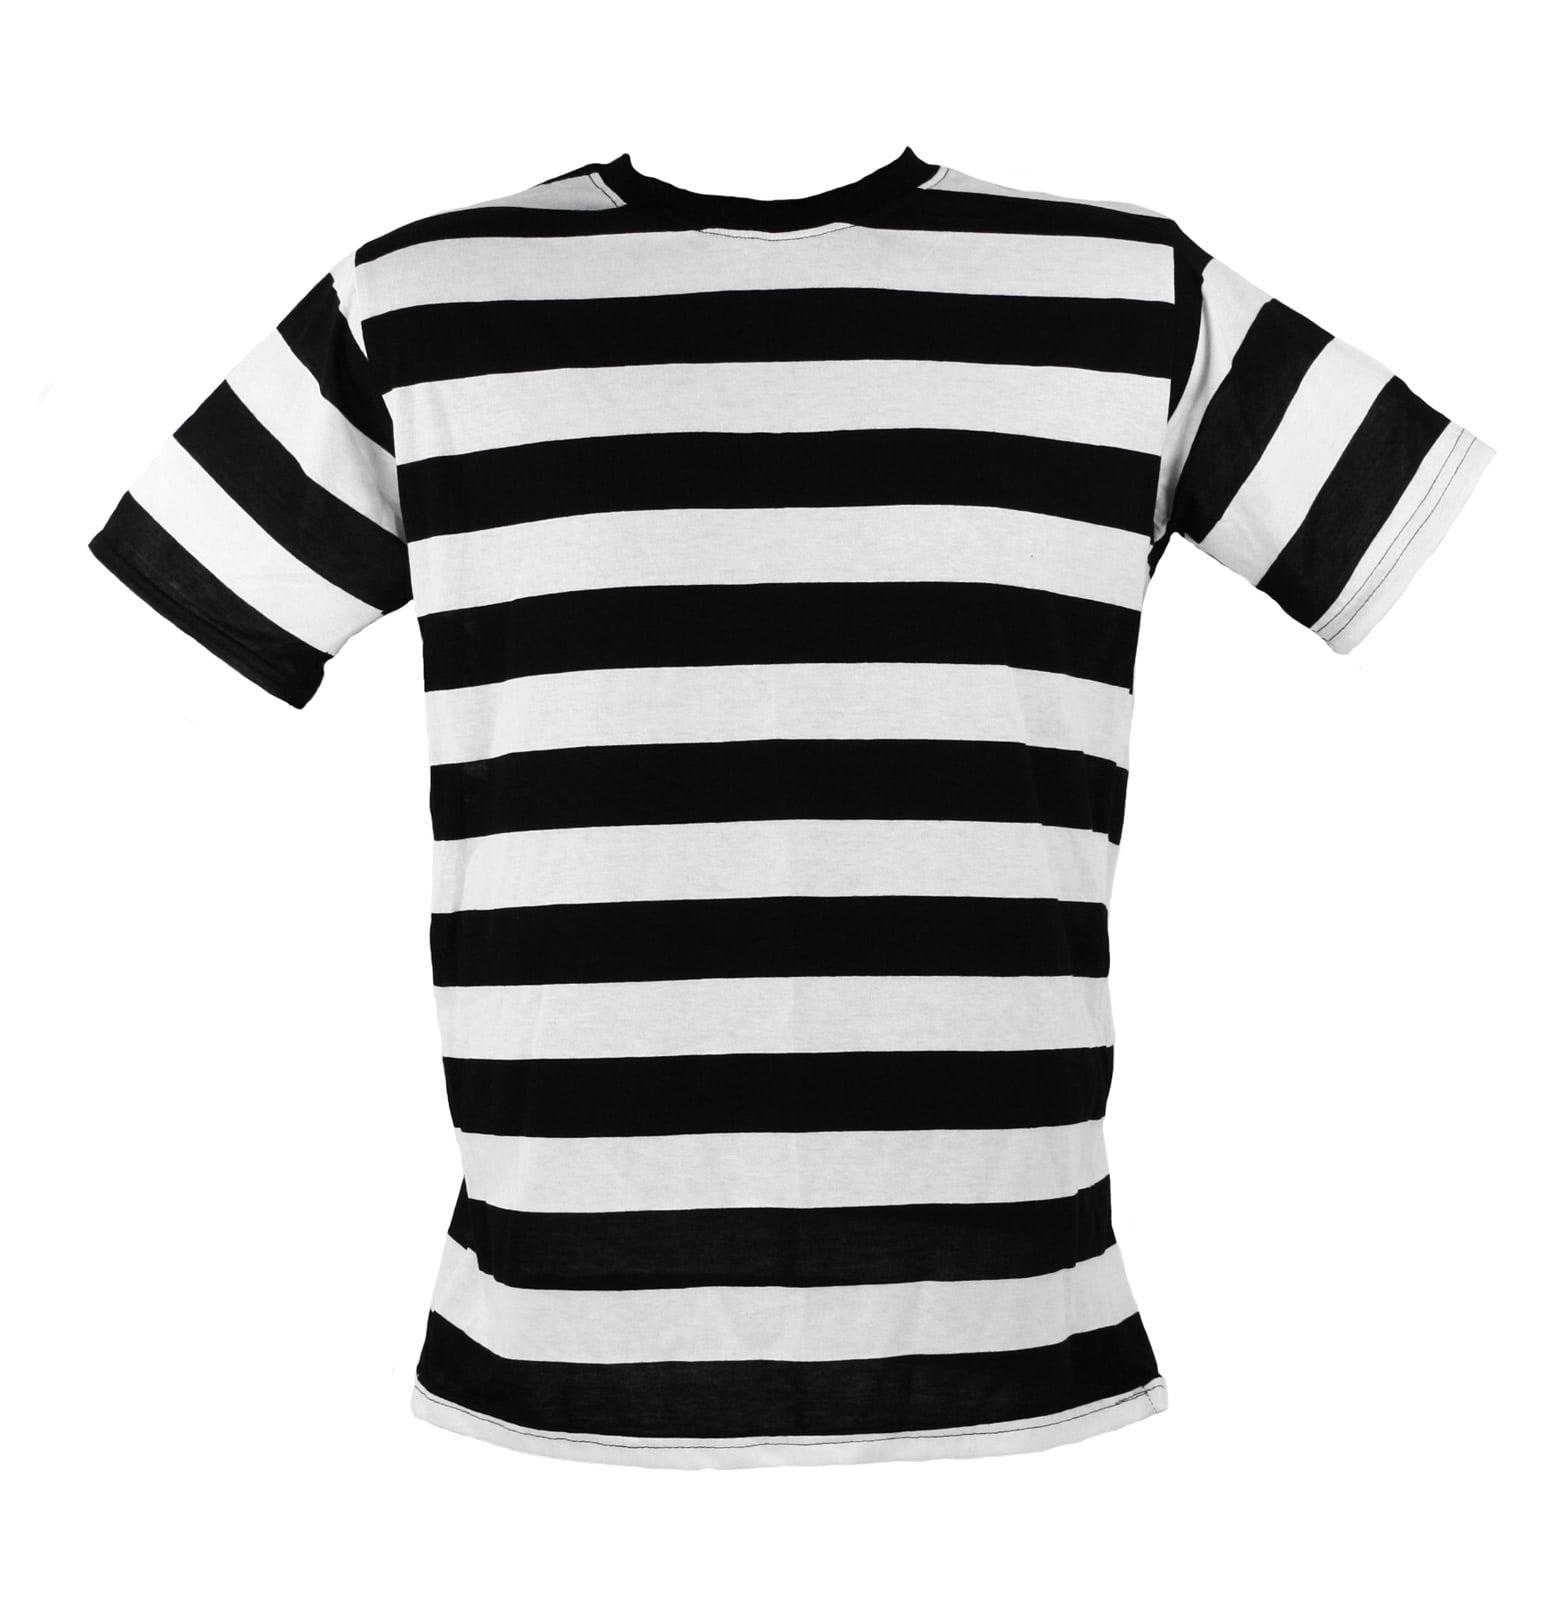 black and white striped shirt short sleeve